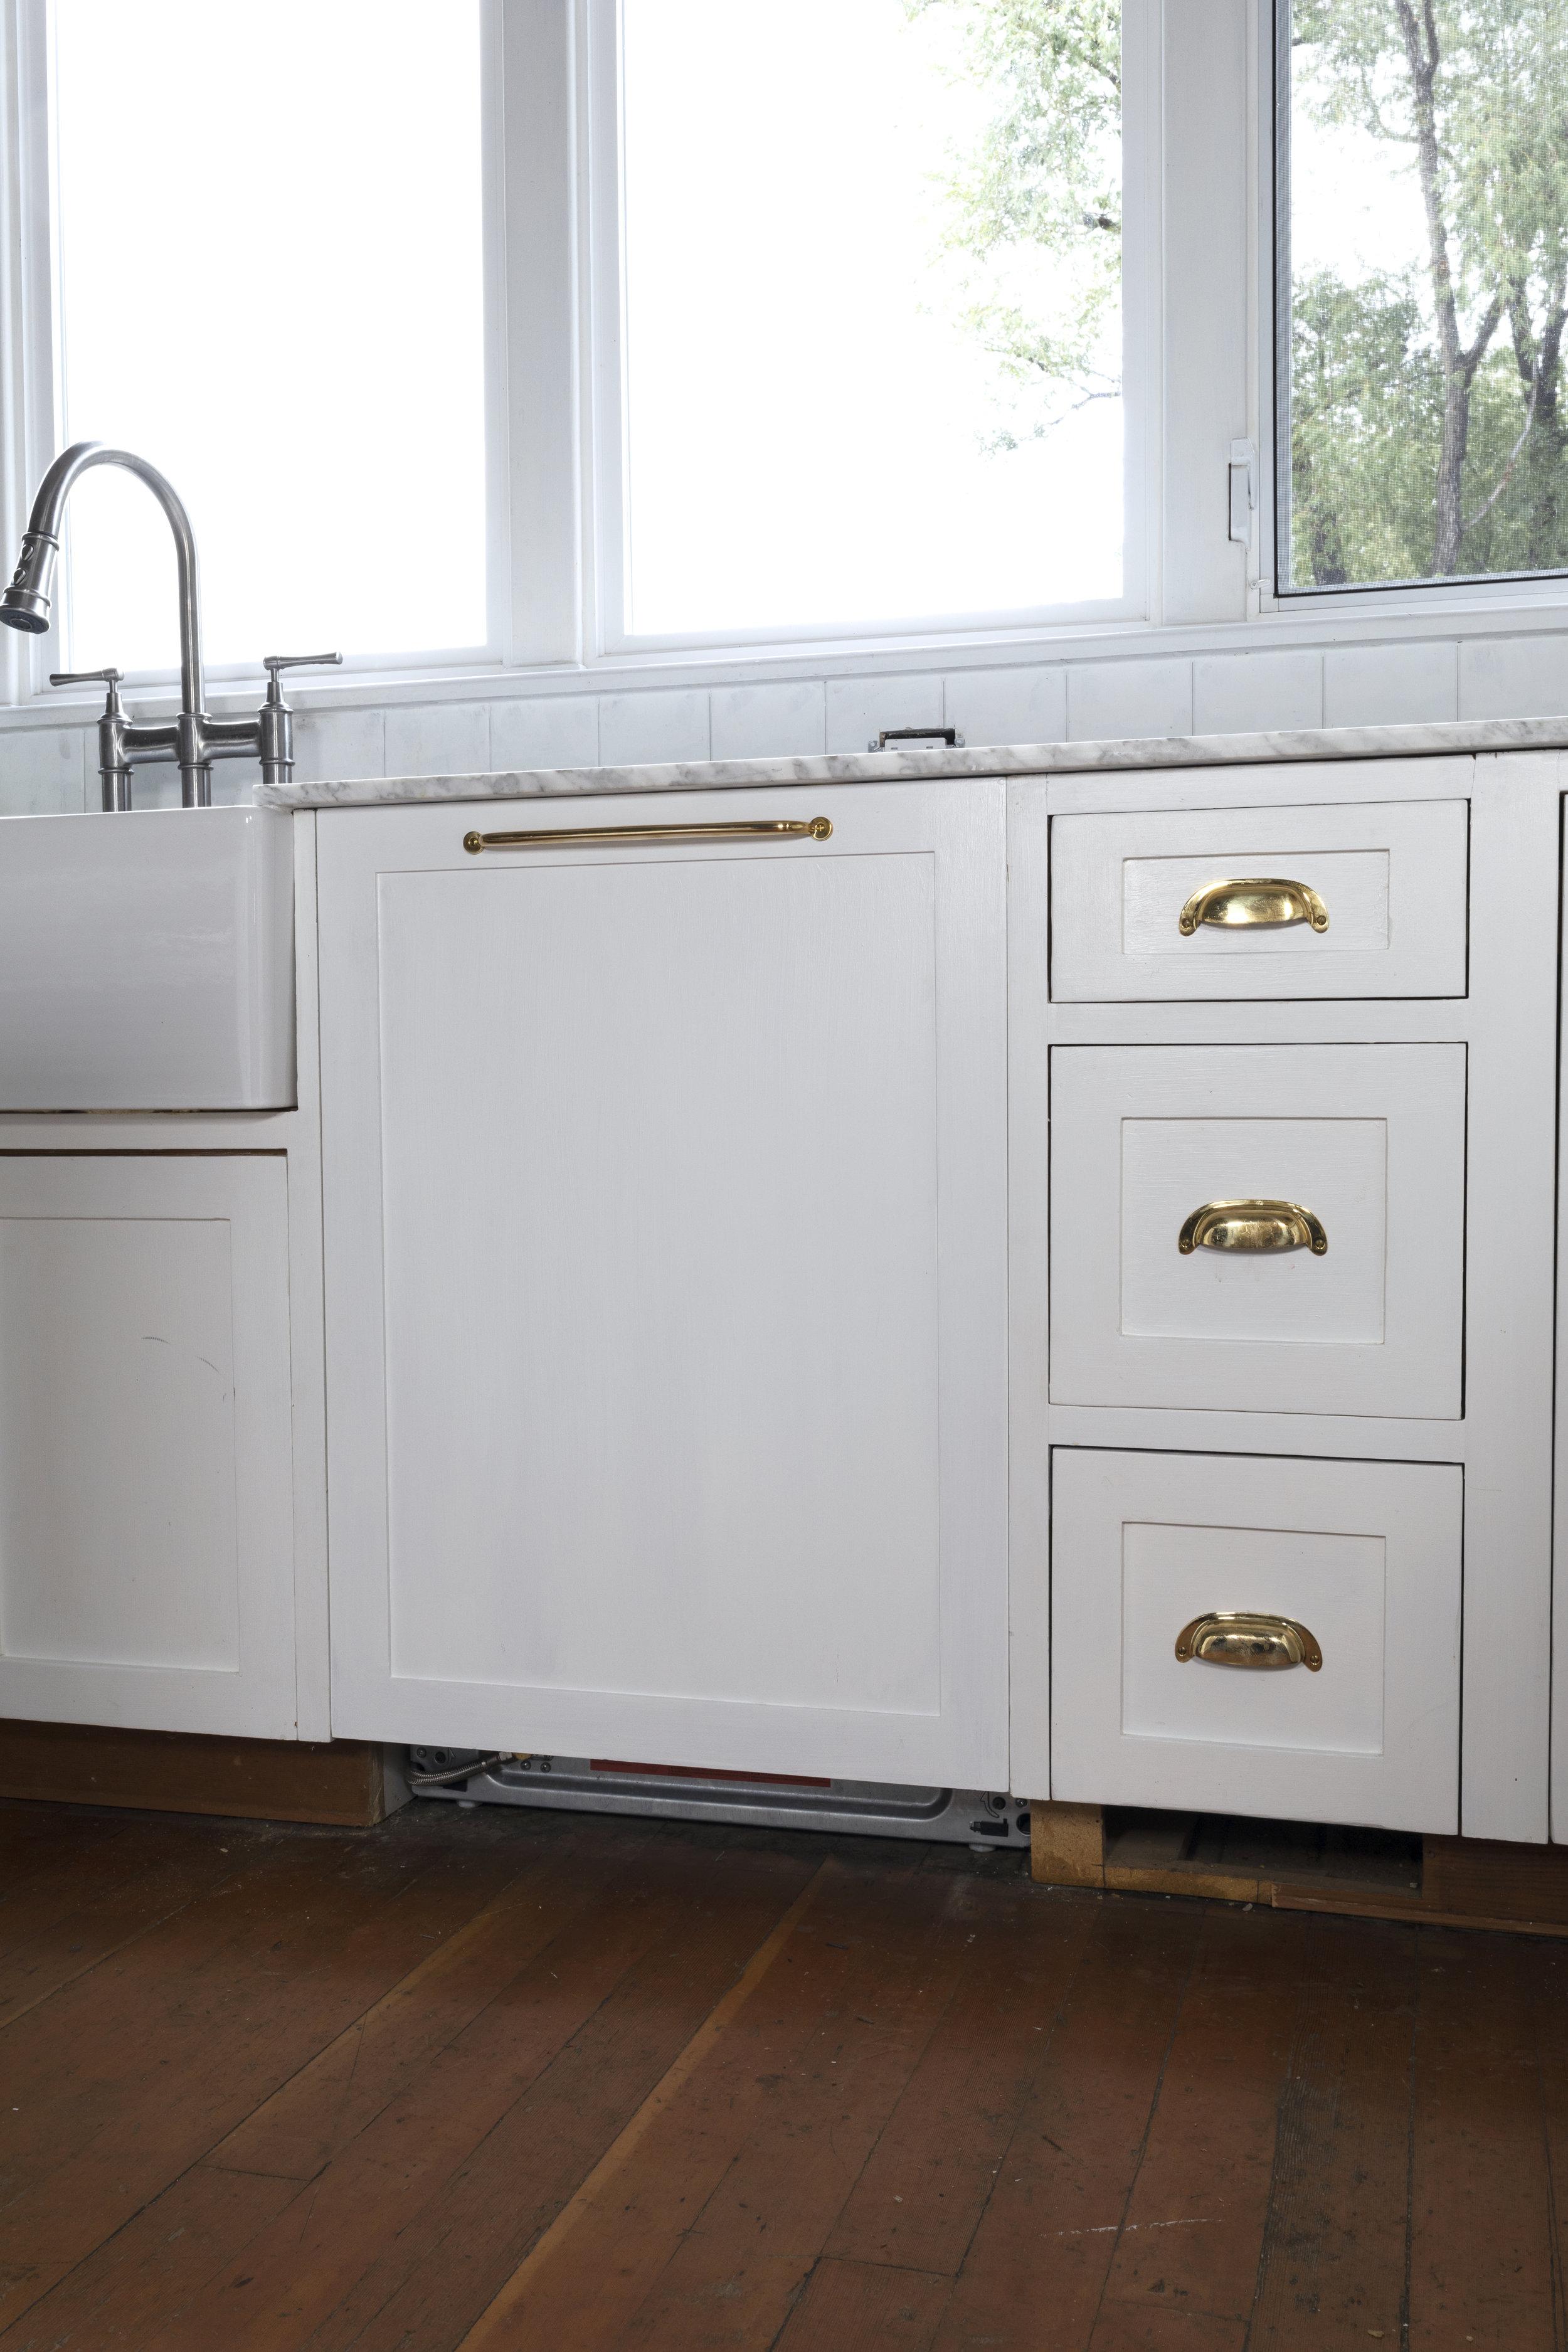 The Grit and Polish - Panel Ready Dishwasher 3.jpg